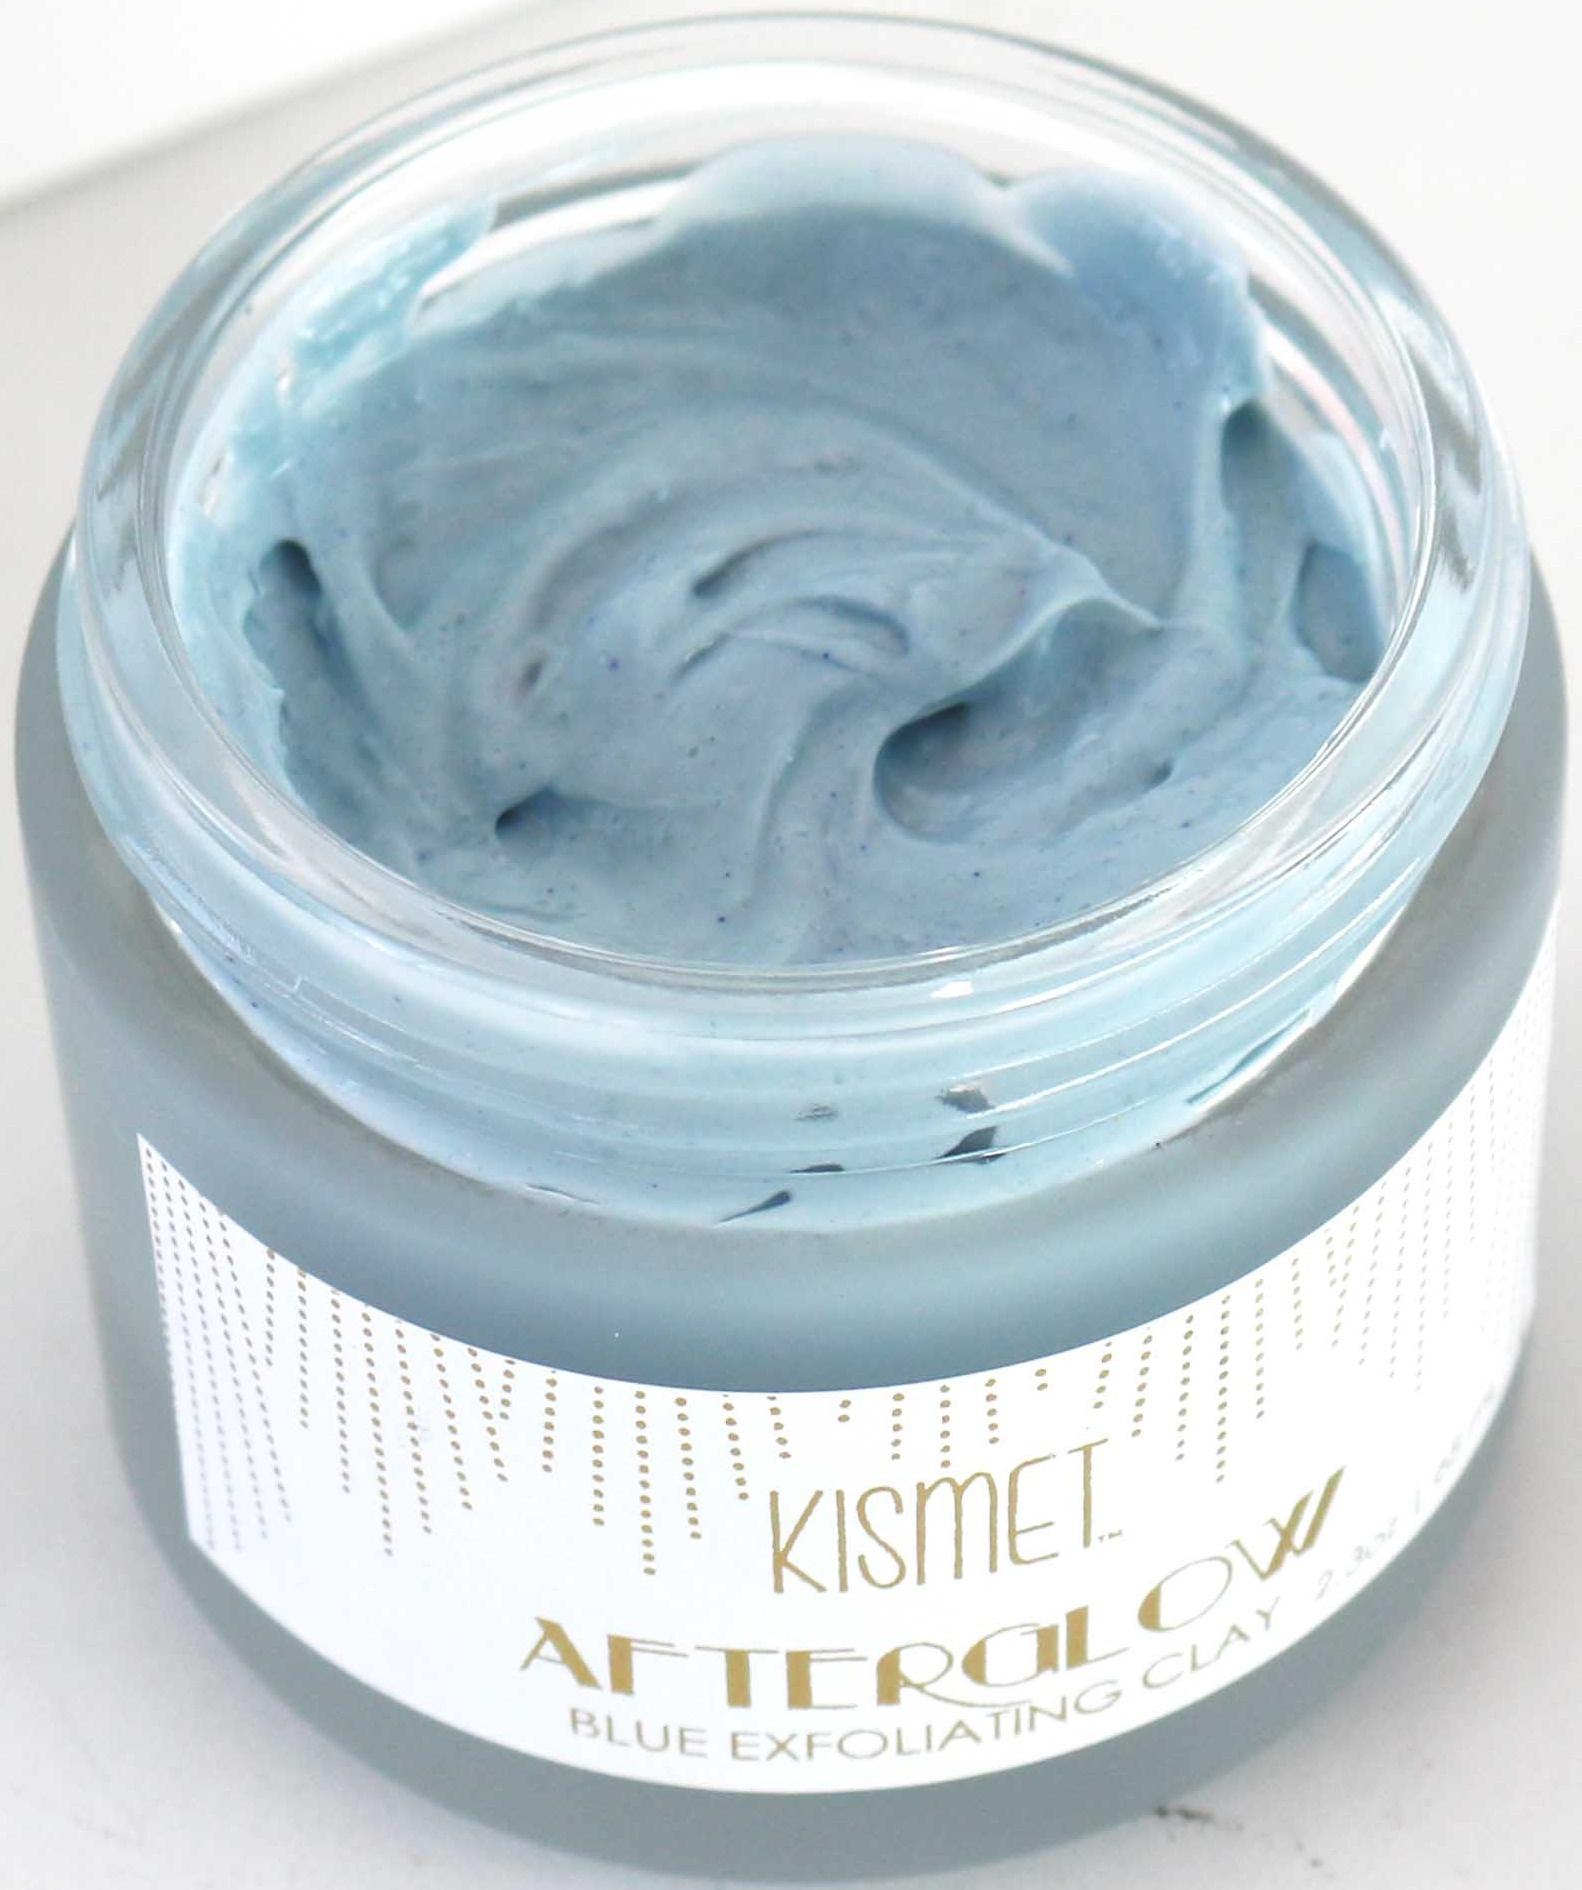 Kismet Afterglow Blue Exfoliating Clay